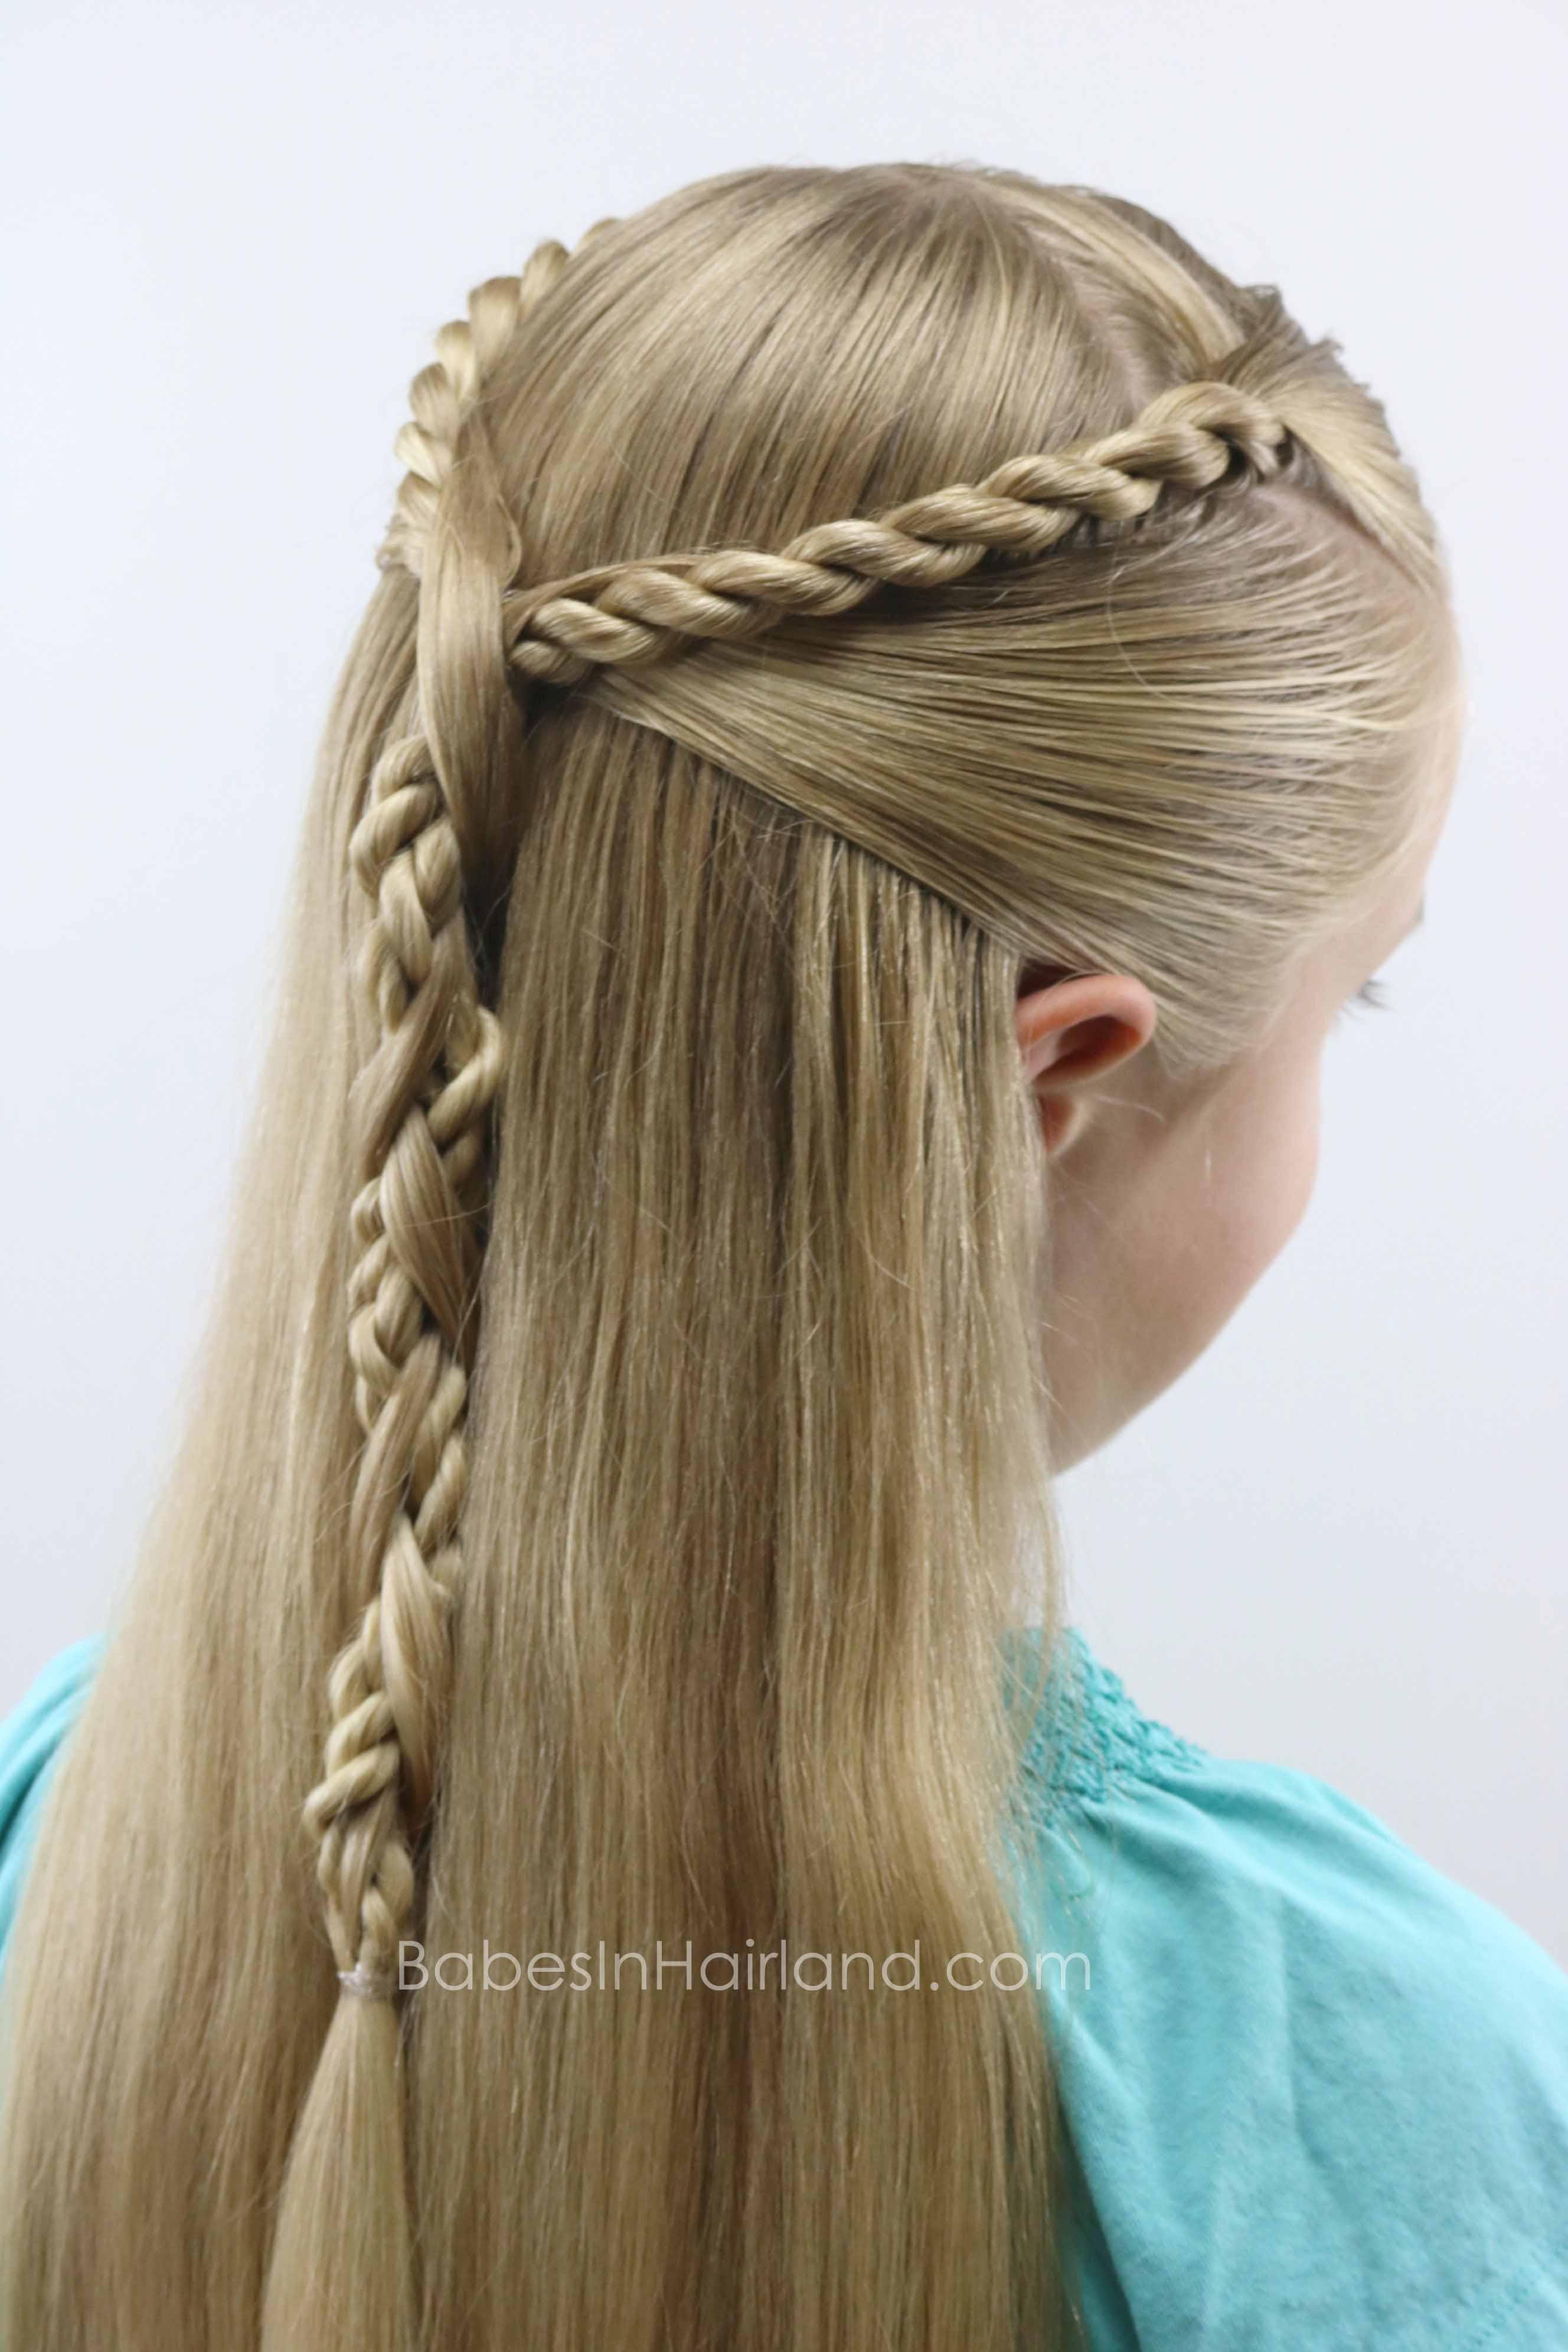 Rope Twist Hawser Braid Pullback Babes In Hairland